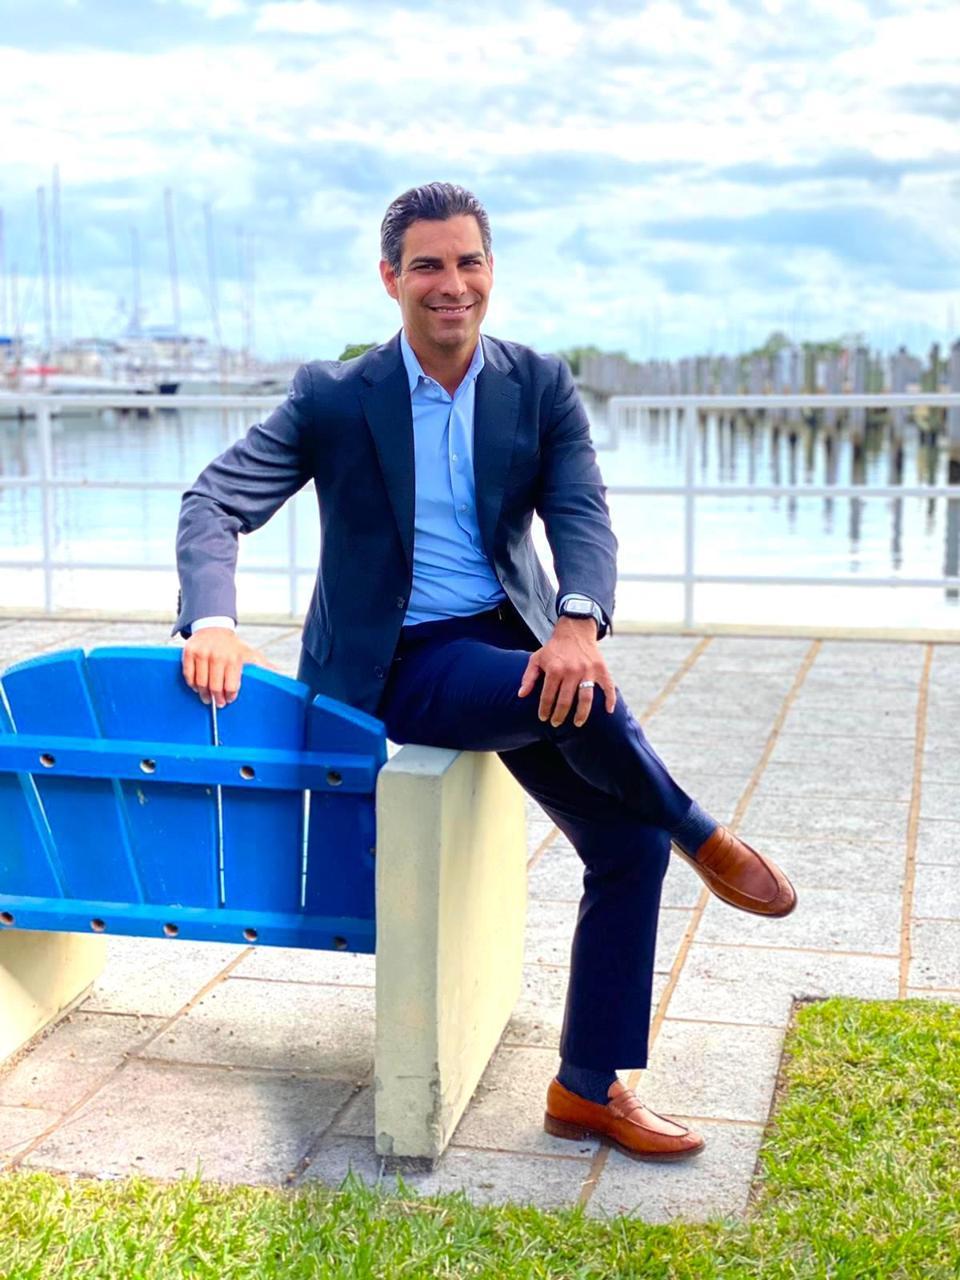 Miami Mayor Francis Suarez silicon valley tech